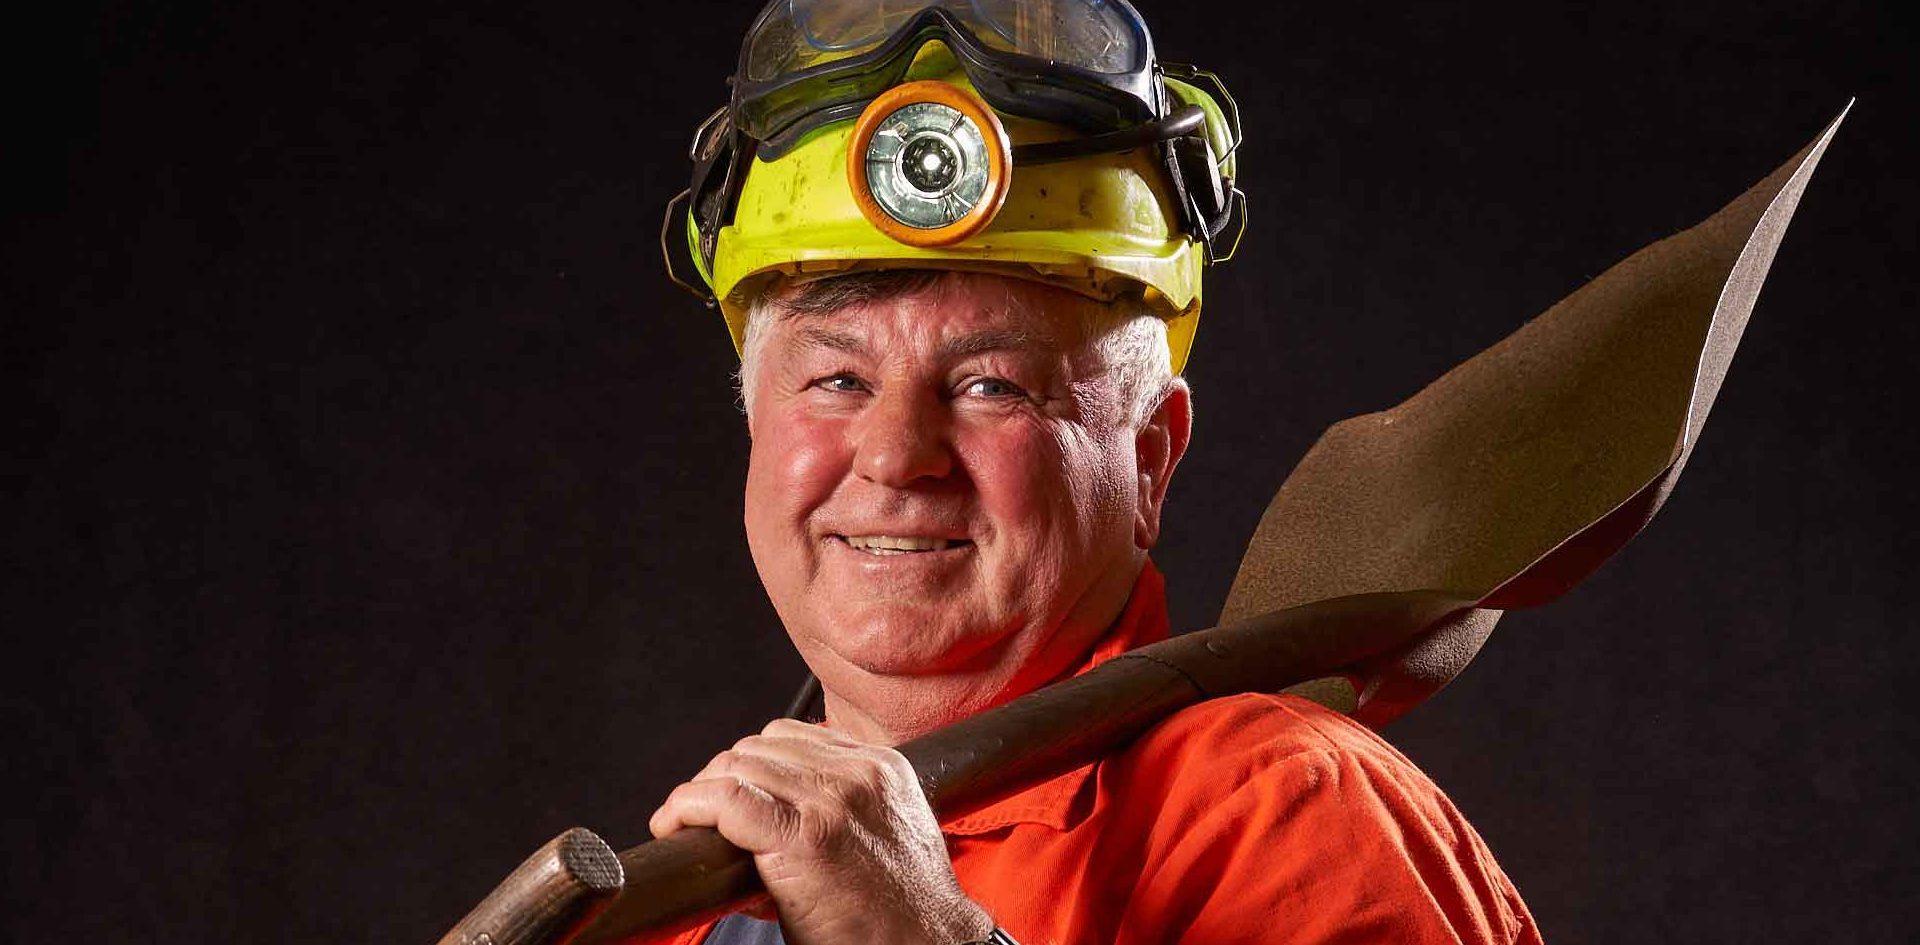 Mining in Games – Hazardous Environments & Minecarts